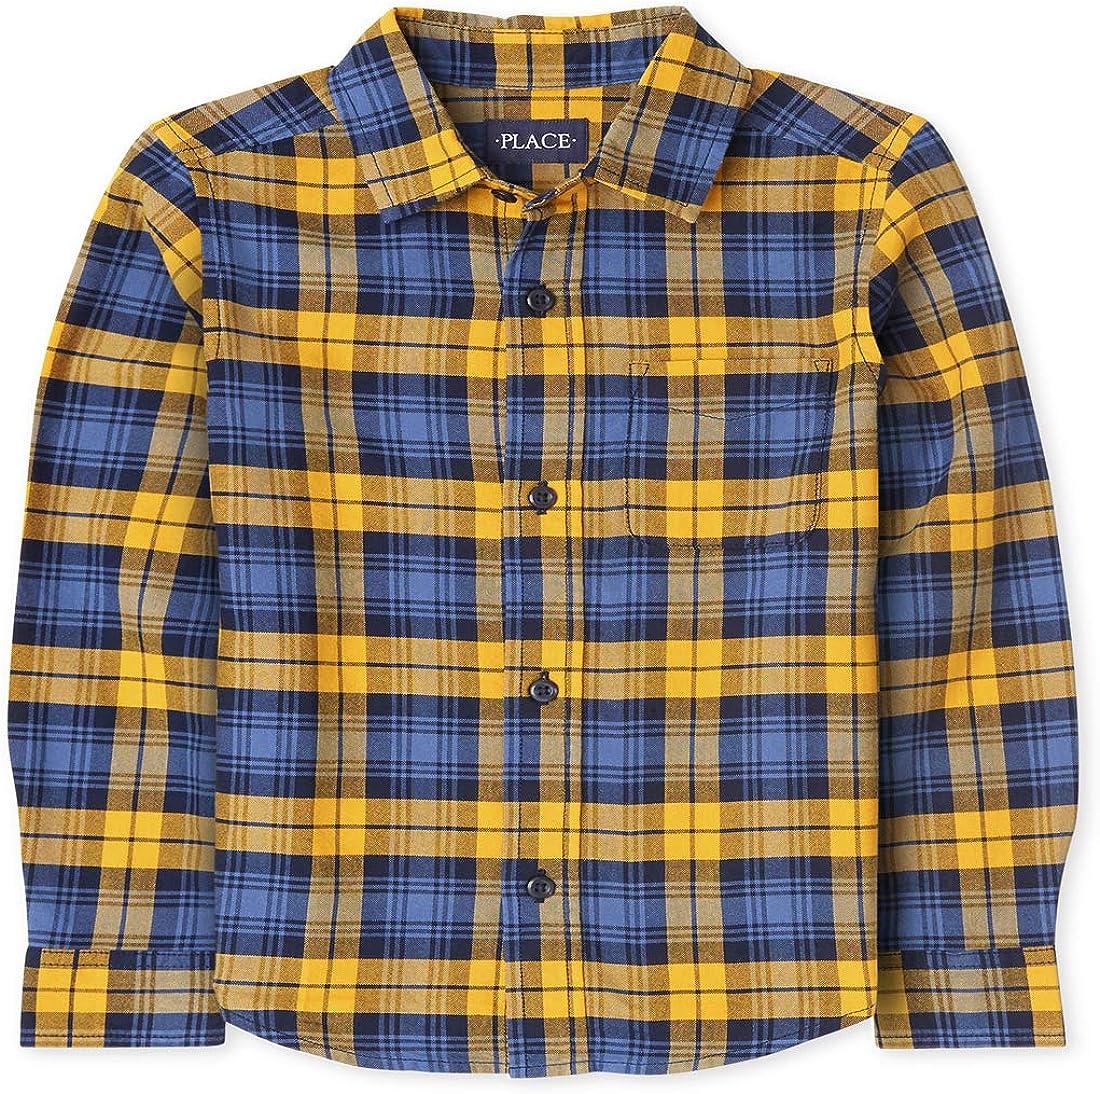 The Children's Place Boys' Plaid Oxford Button Down Shirt